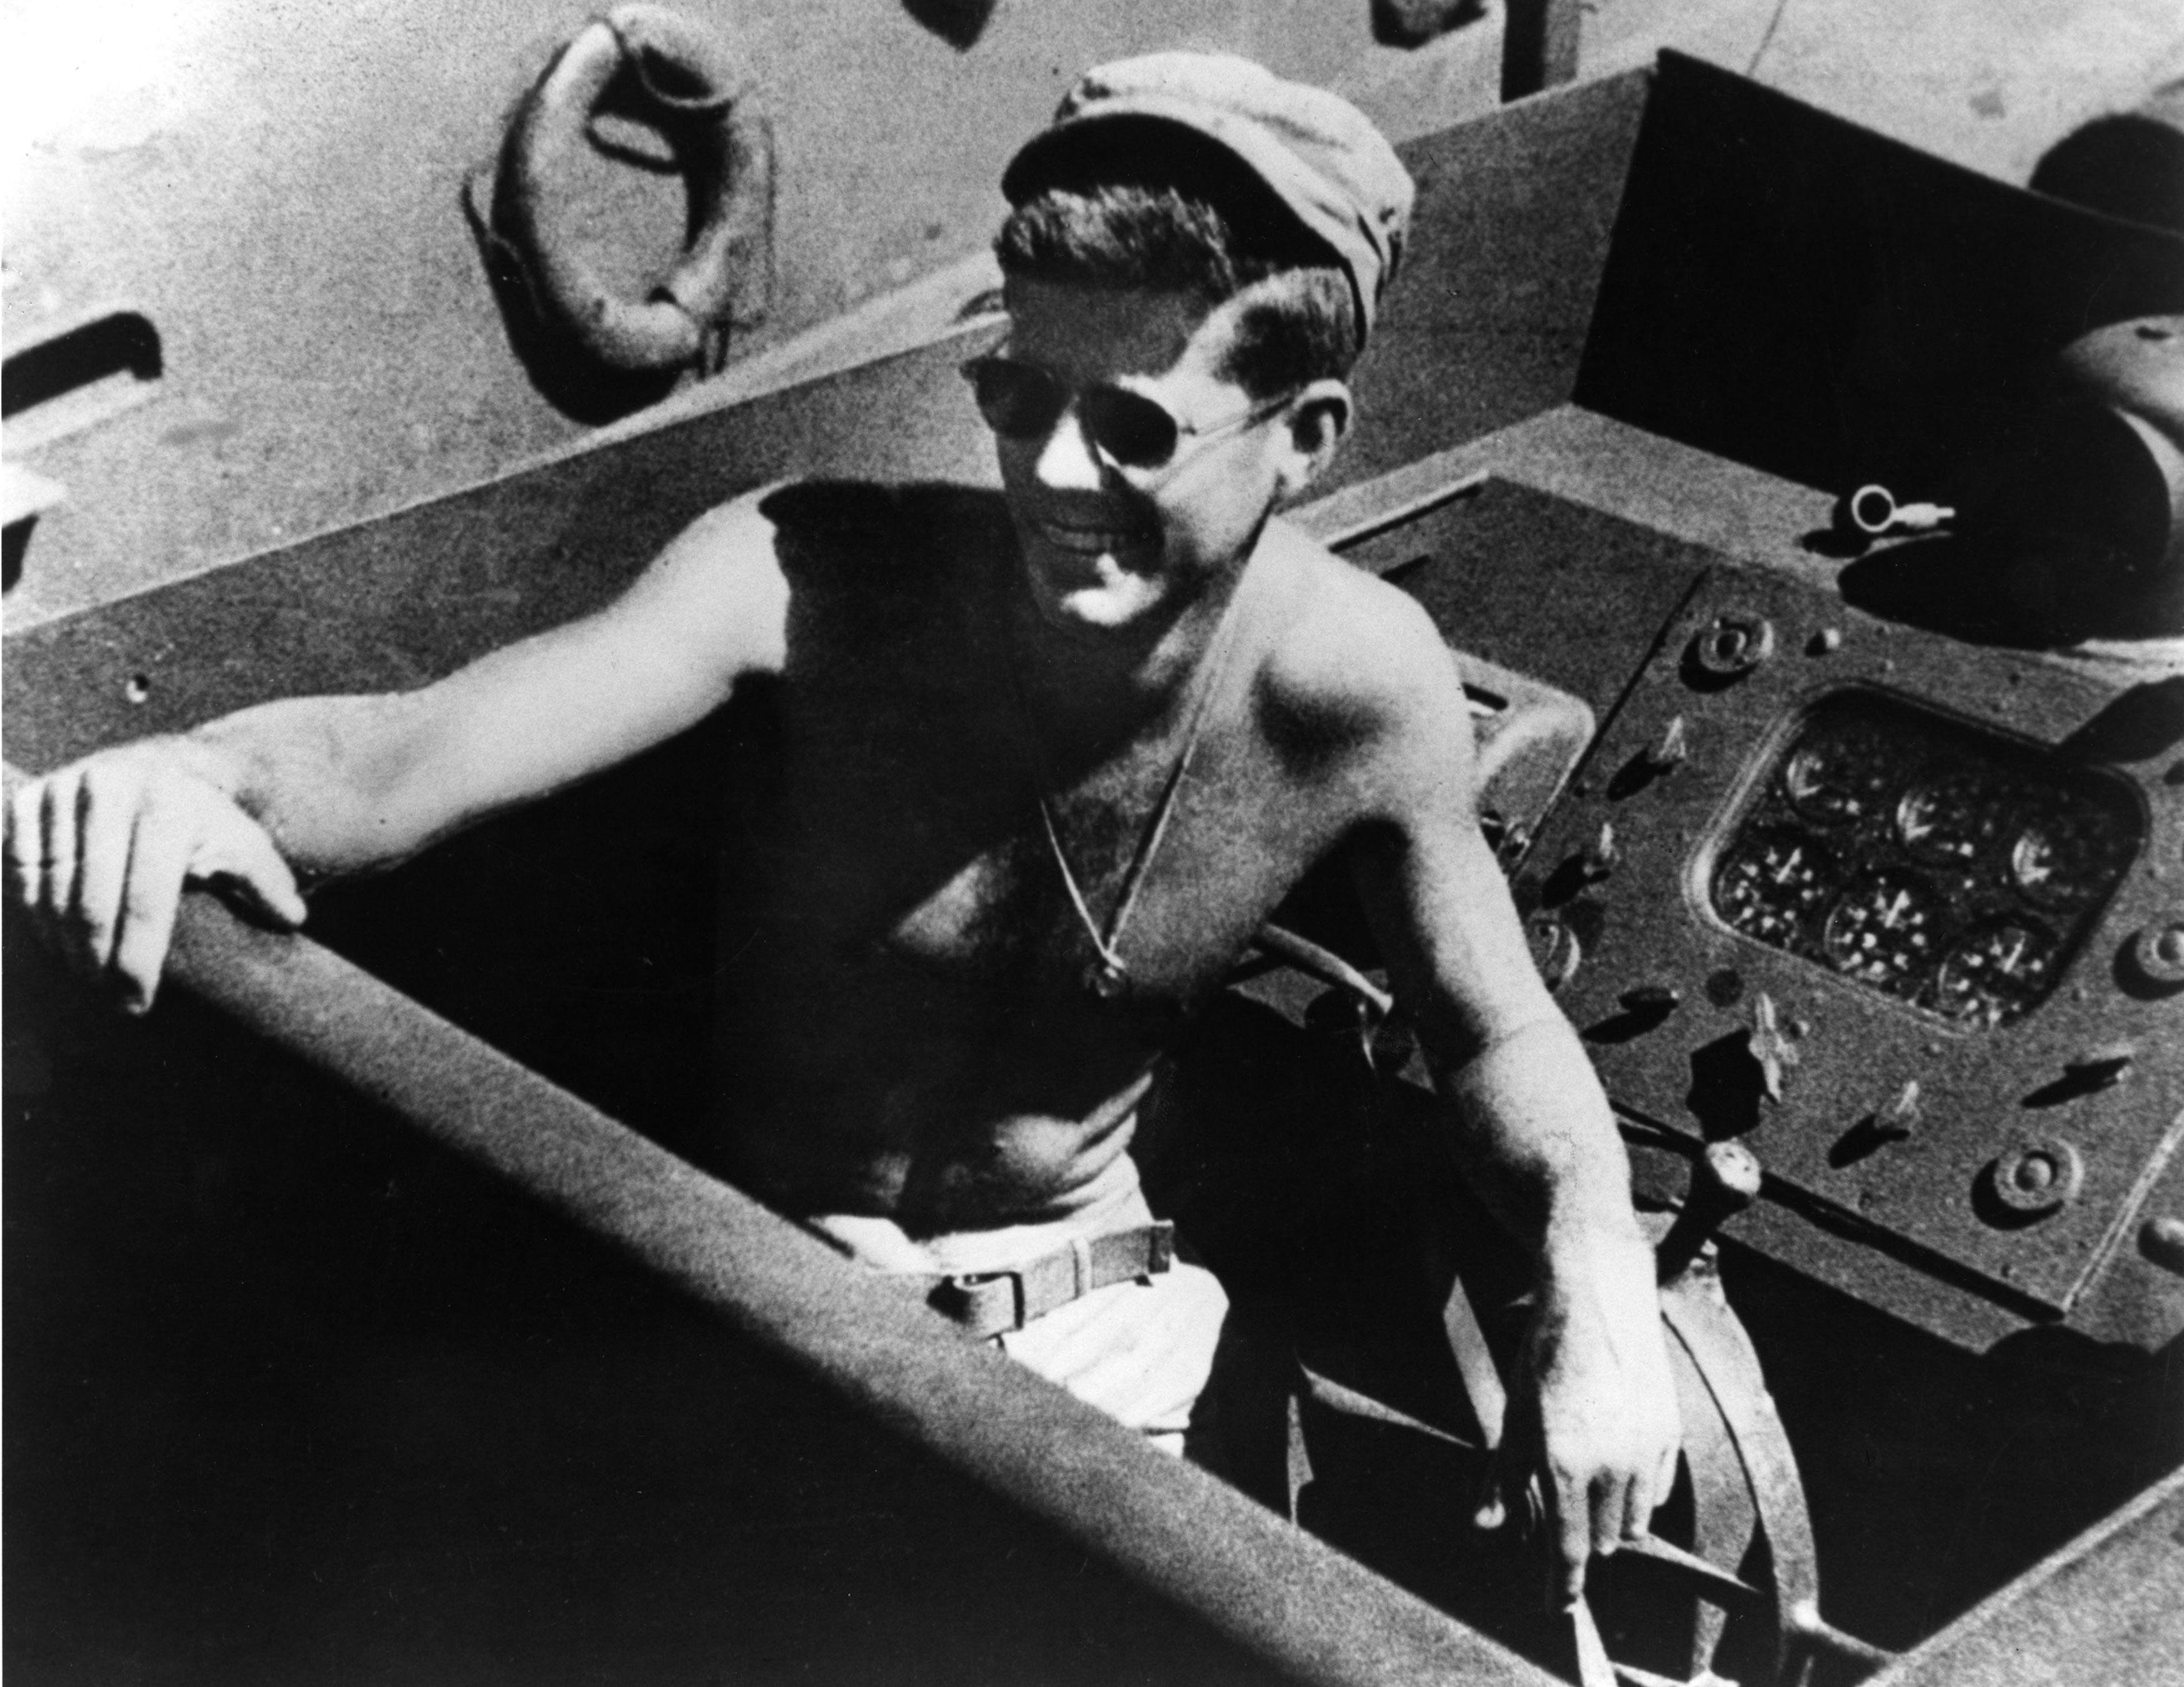 Lieutenant Kennedy